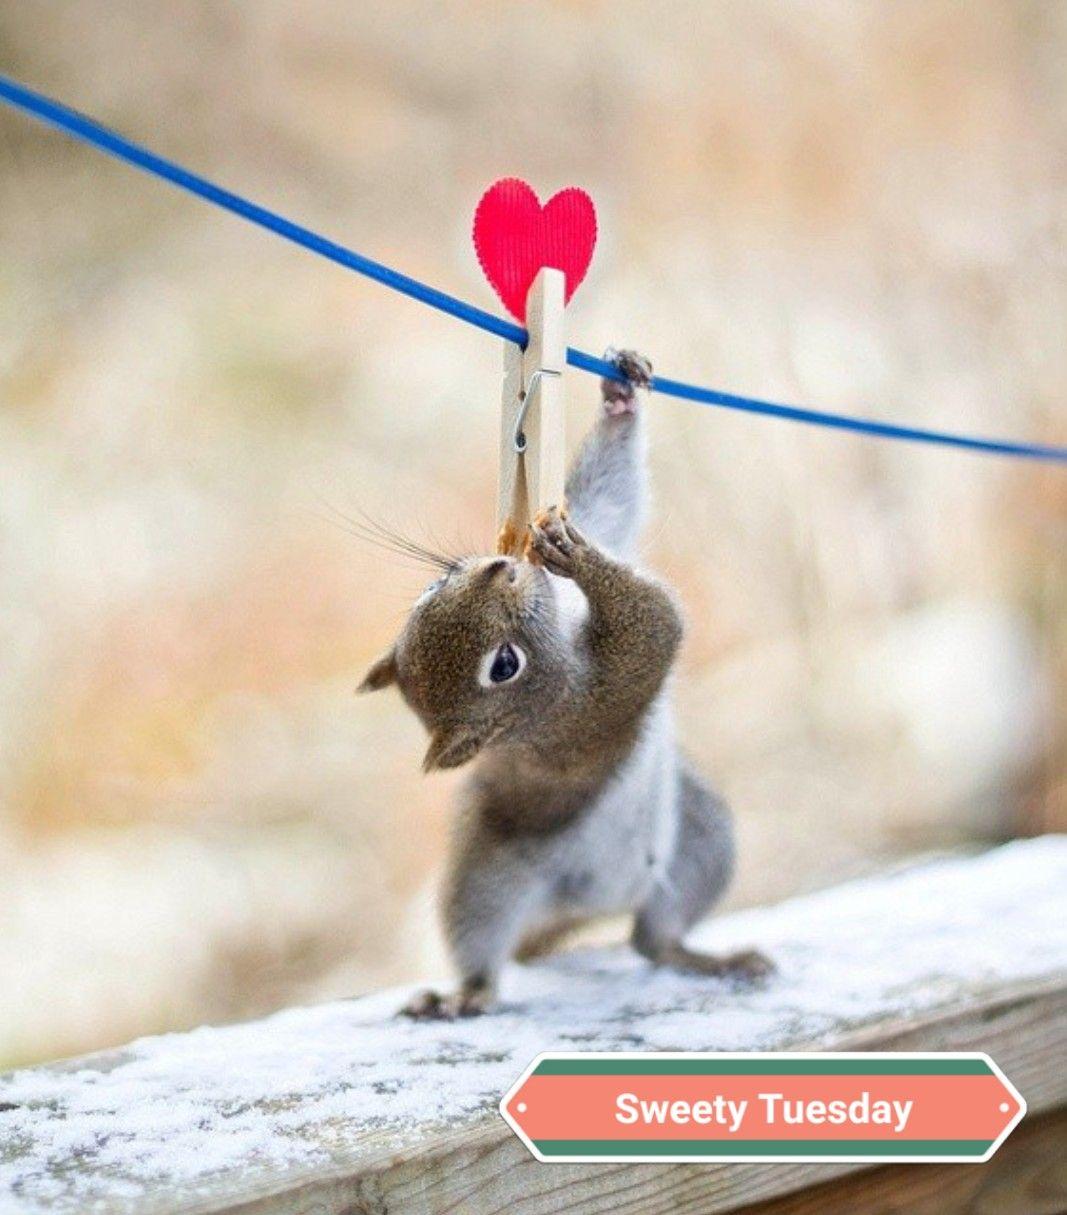 Squirrel กระรอก ส ตว น าร ก